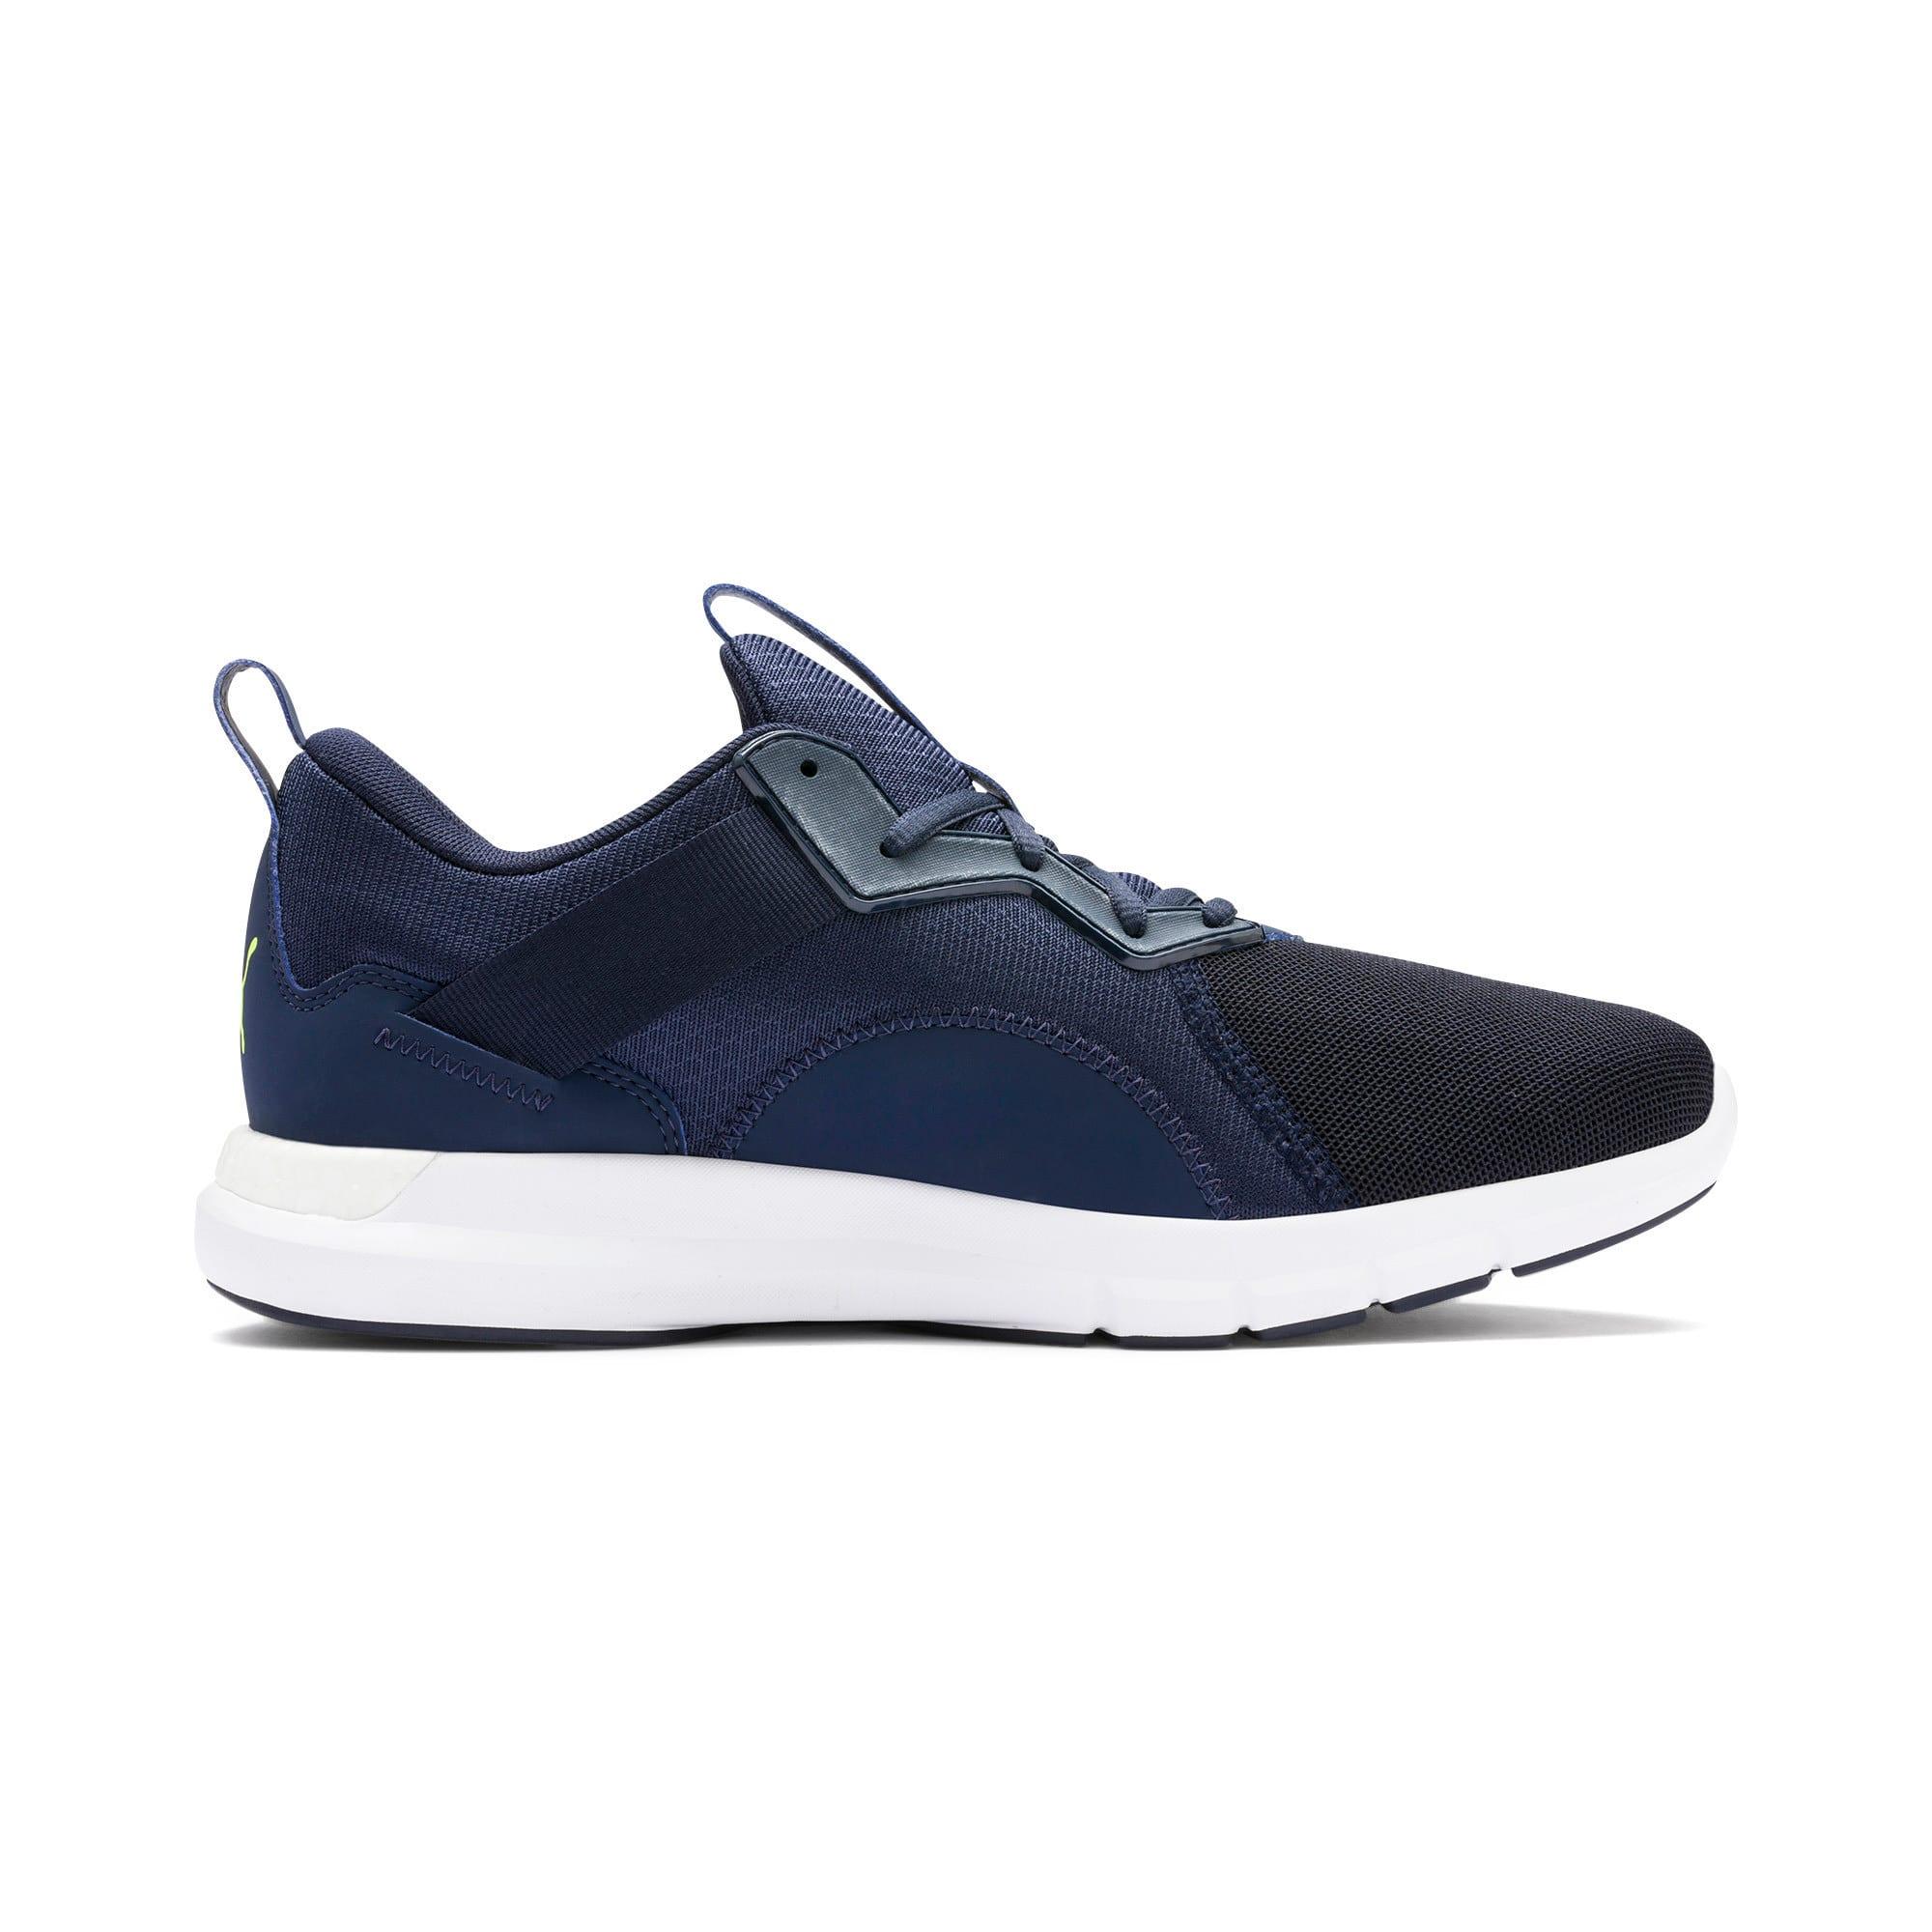 Thumbnail 6 of NRGY Dynamo Futuro Men's Running Shoes, Peacoat-Puma White, medium